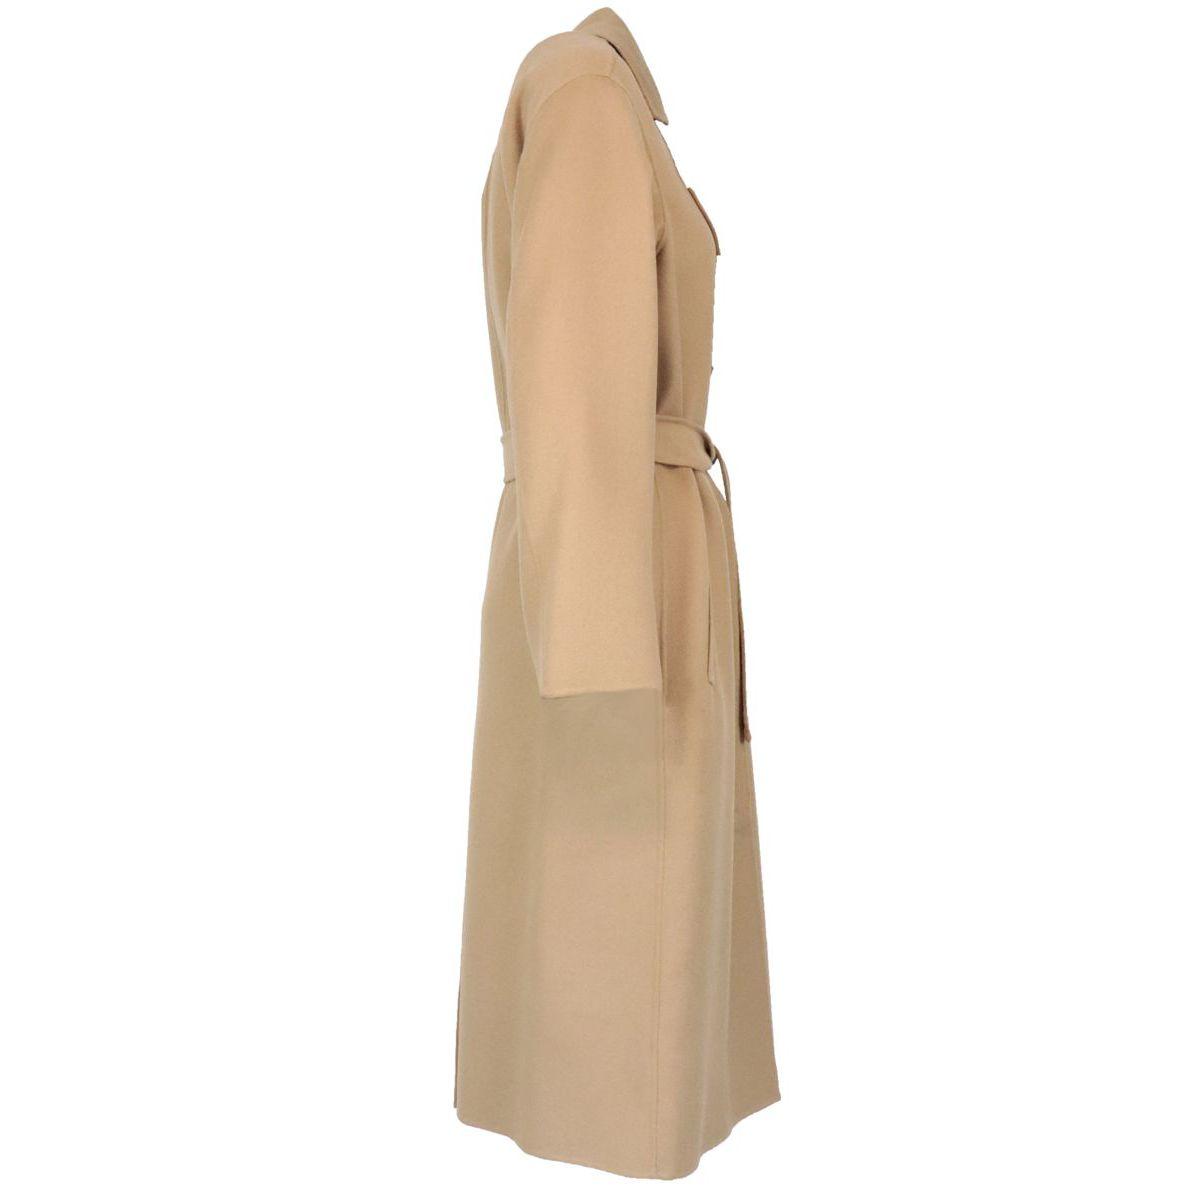 Belted Ermanna coat in wool blend Camel MAX MARA STUDIO